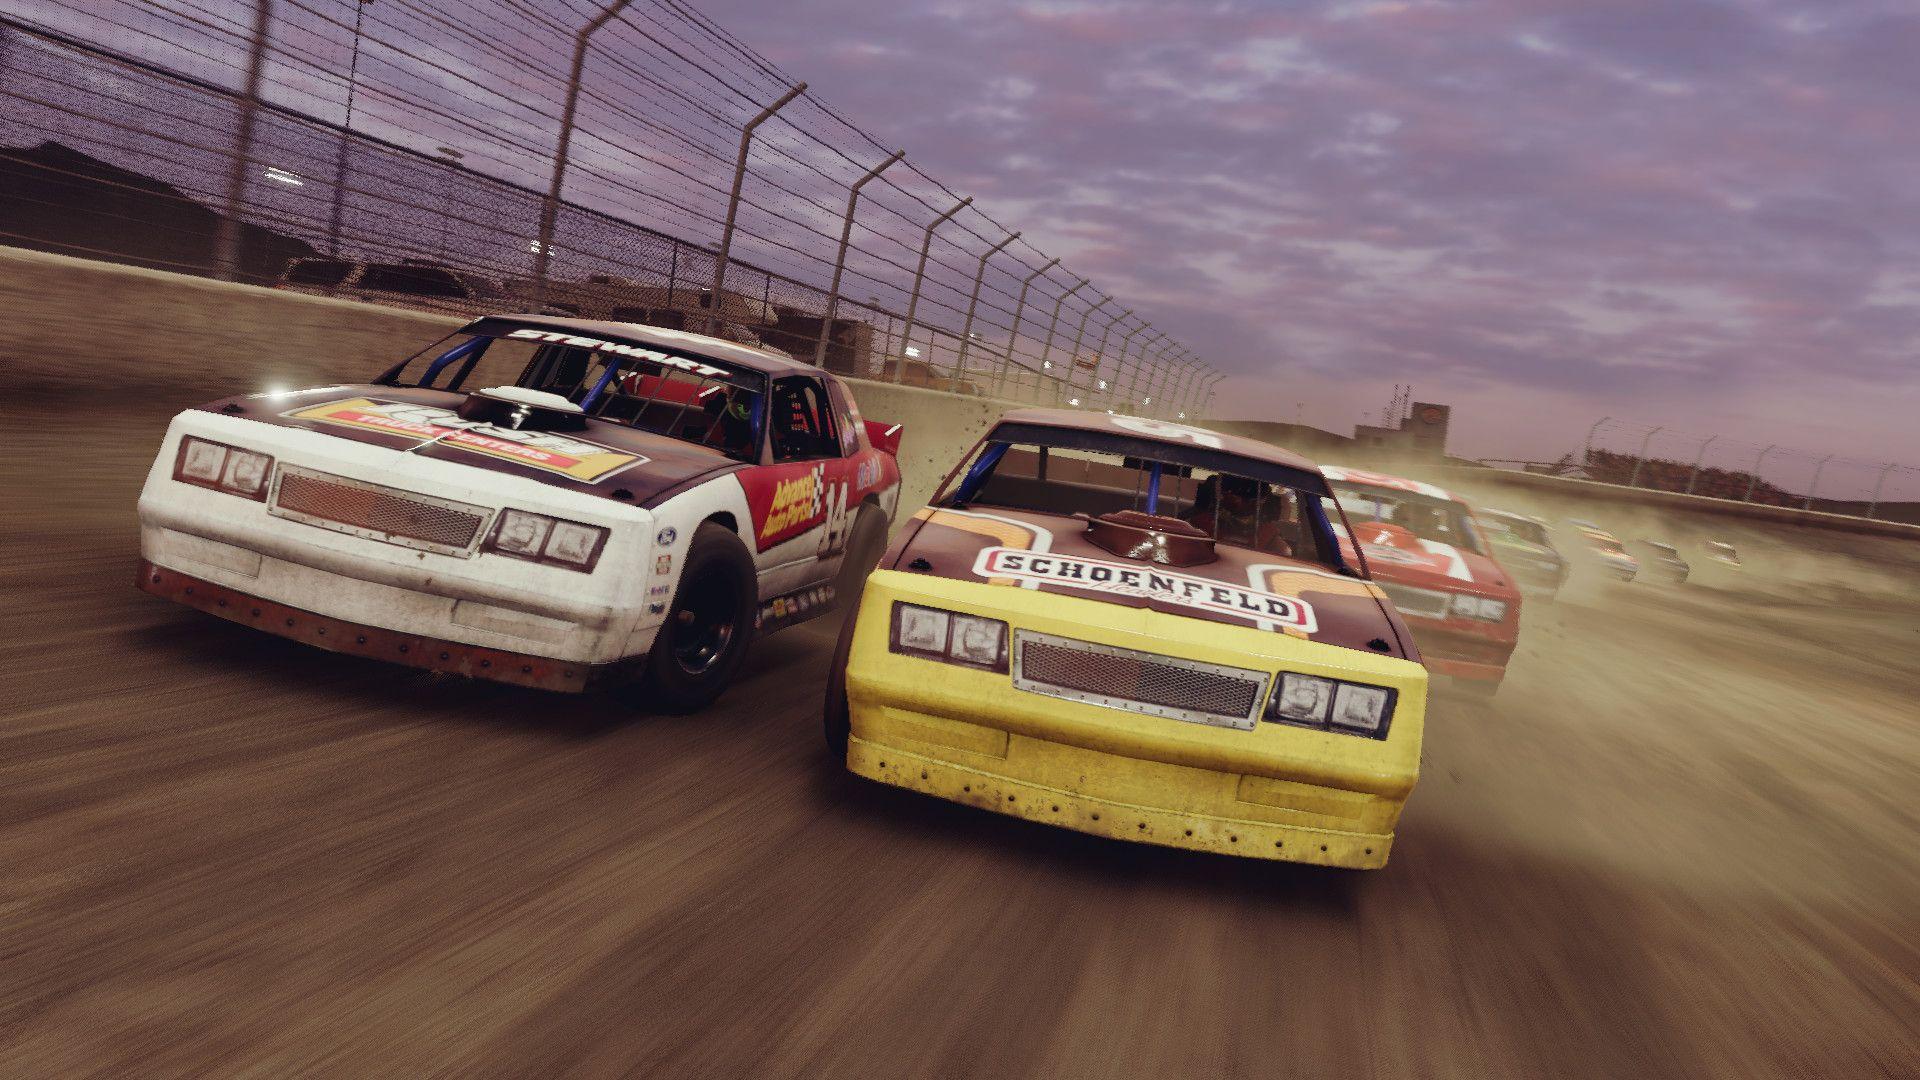 Tony Stewart's All-American Racing: The Dirt Track at Las Vegas Motor Speedway